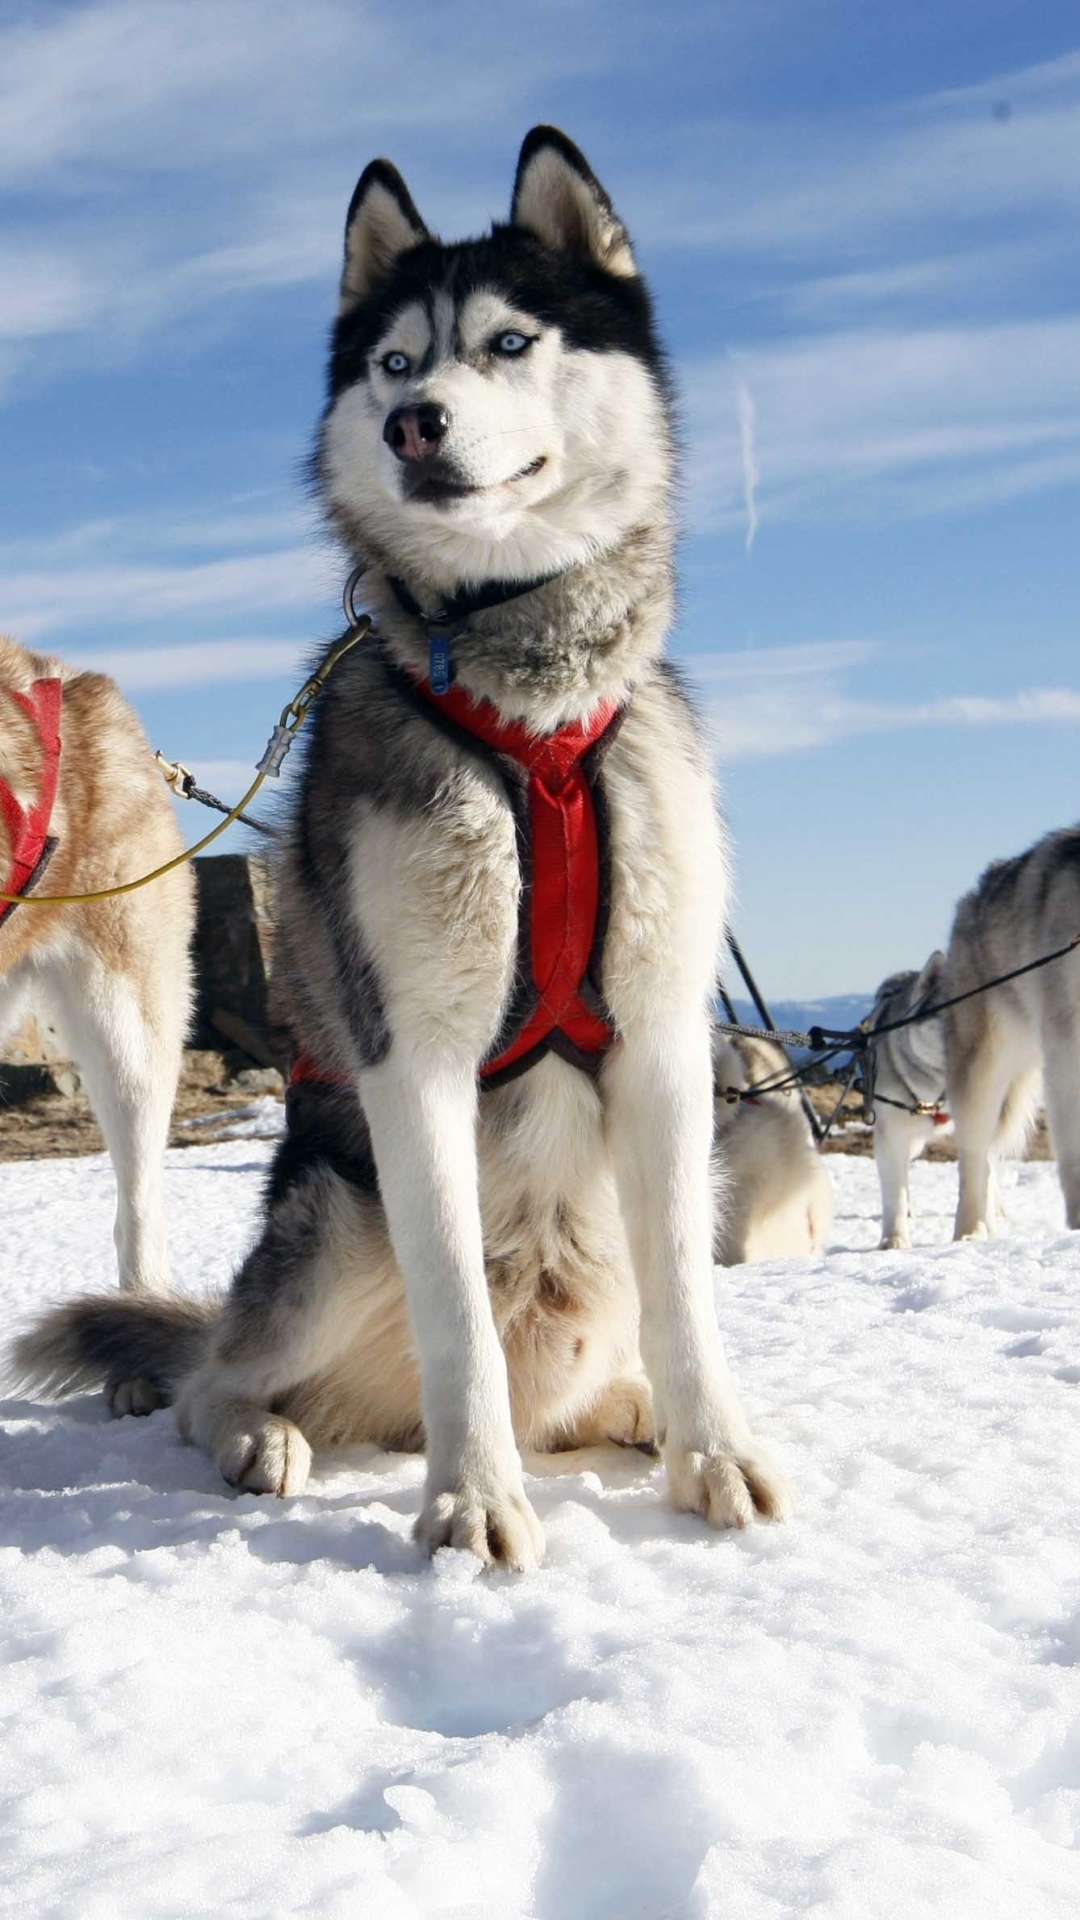 Husky Dog Alaska Snow iPhone 6 Wallpaper Download iPhone Wallpapers 1080x1920